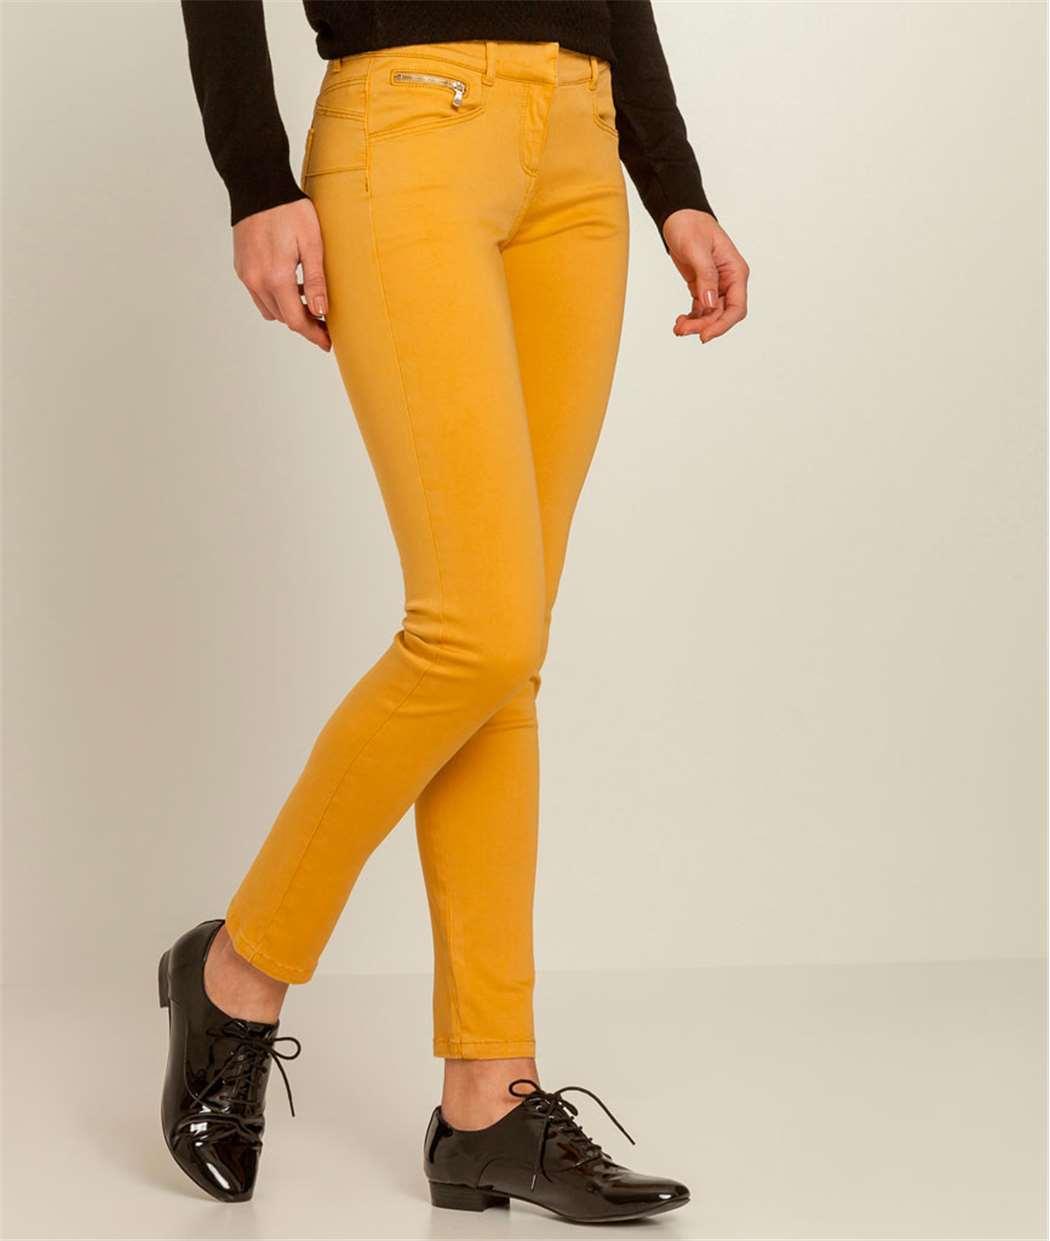 Pantalon femme push up SAFRAN - Grain de Malice